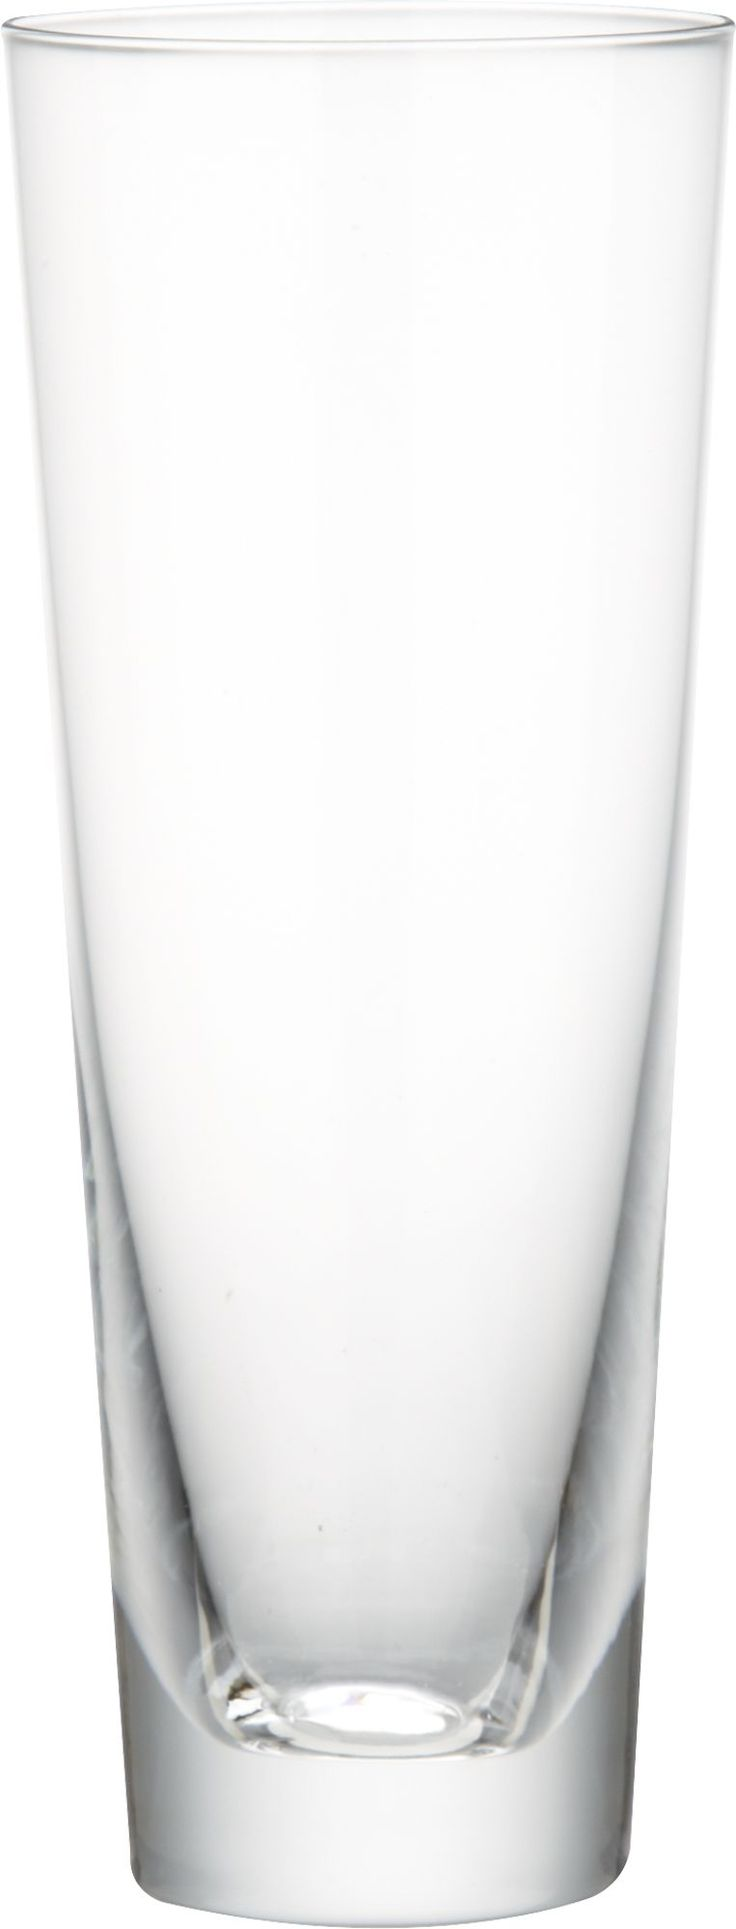 Glassware: I like tall drink glasses... Biggs Long Drink Glass C&B